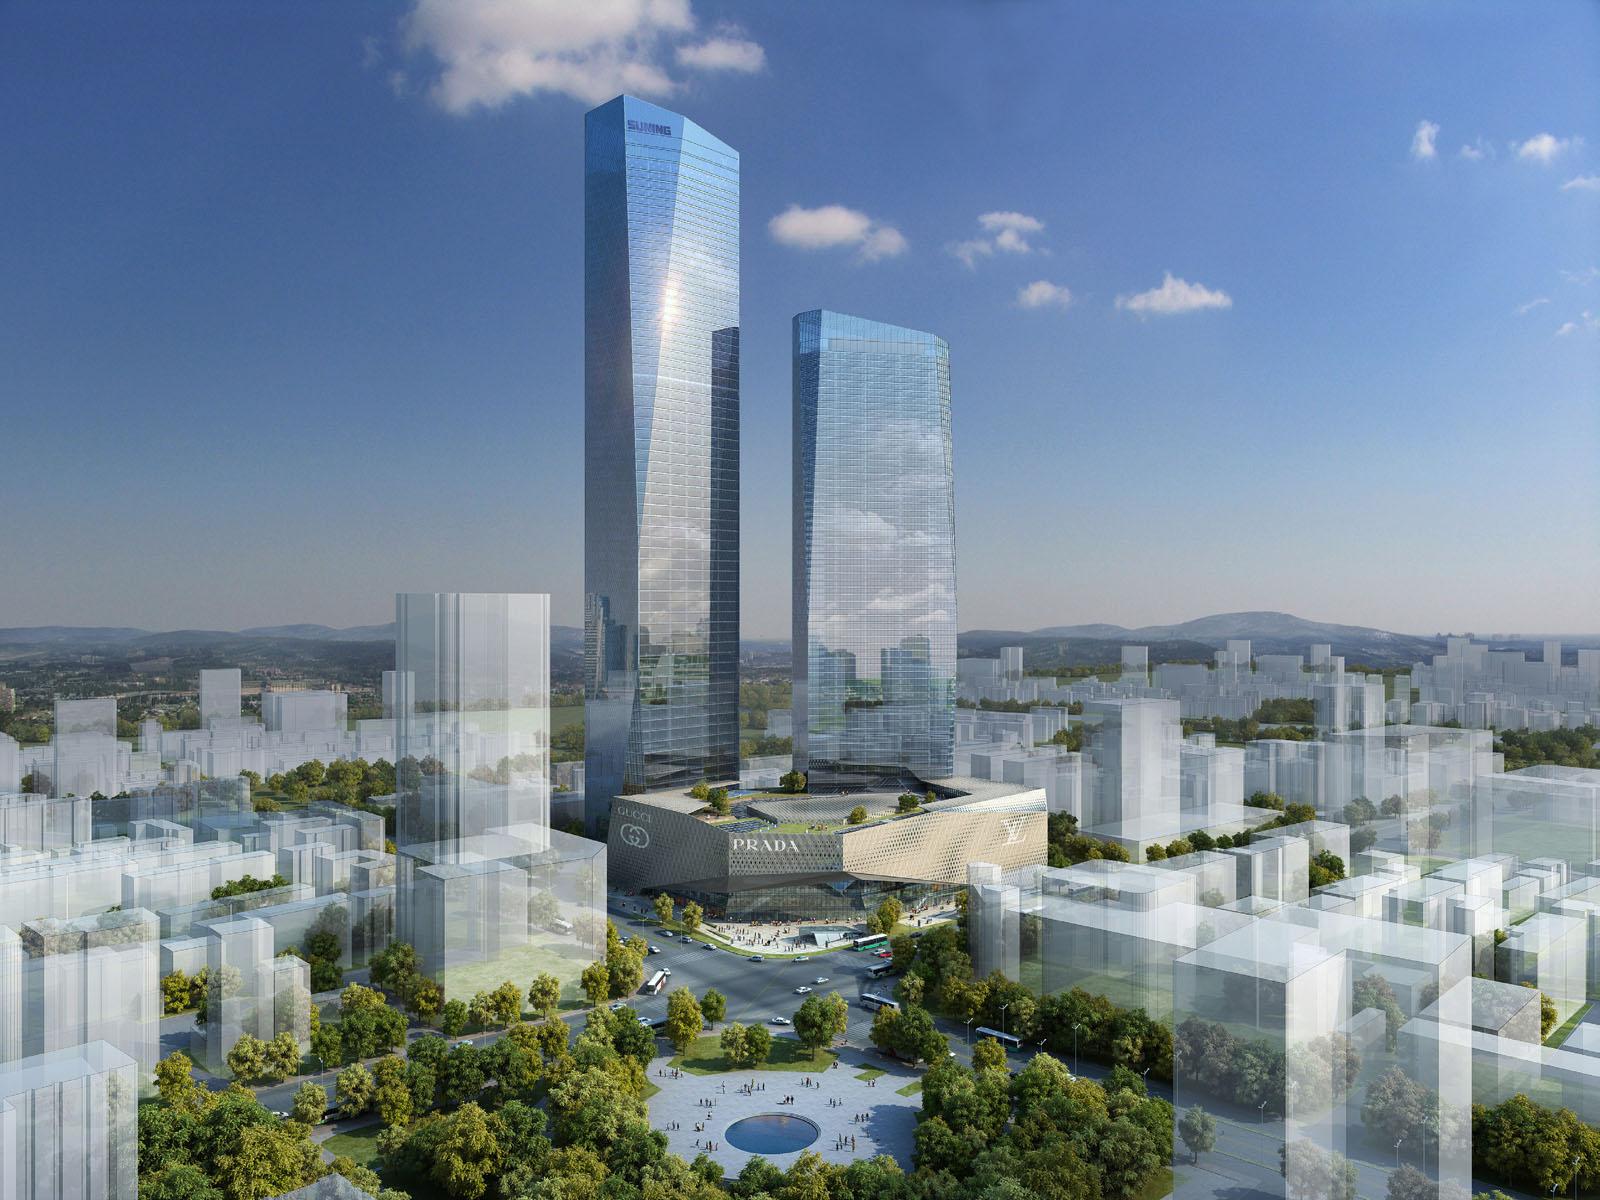 10 edificios más altos 2016 7 suning plaza tower 1